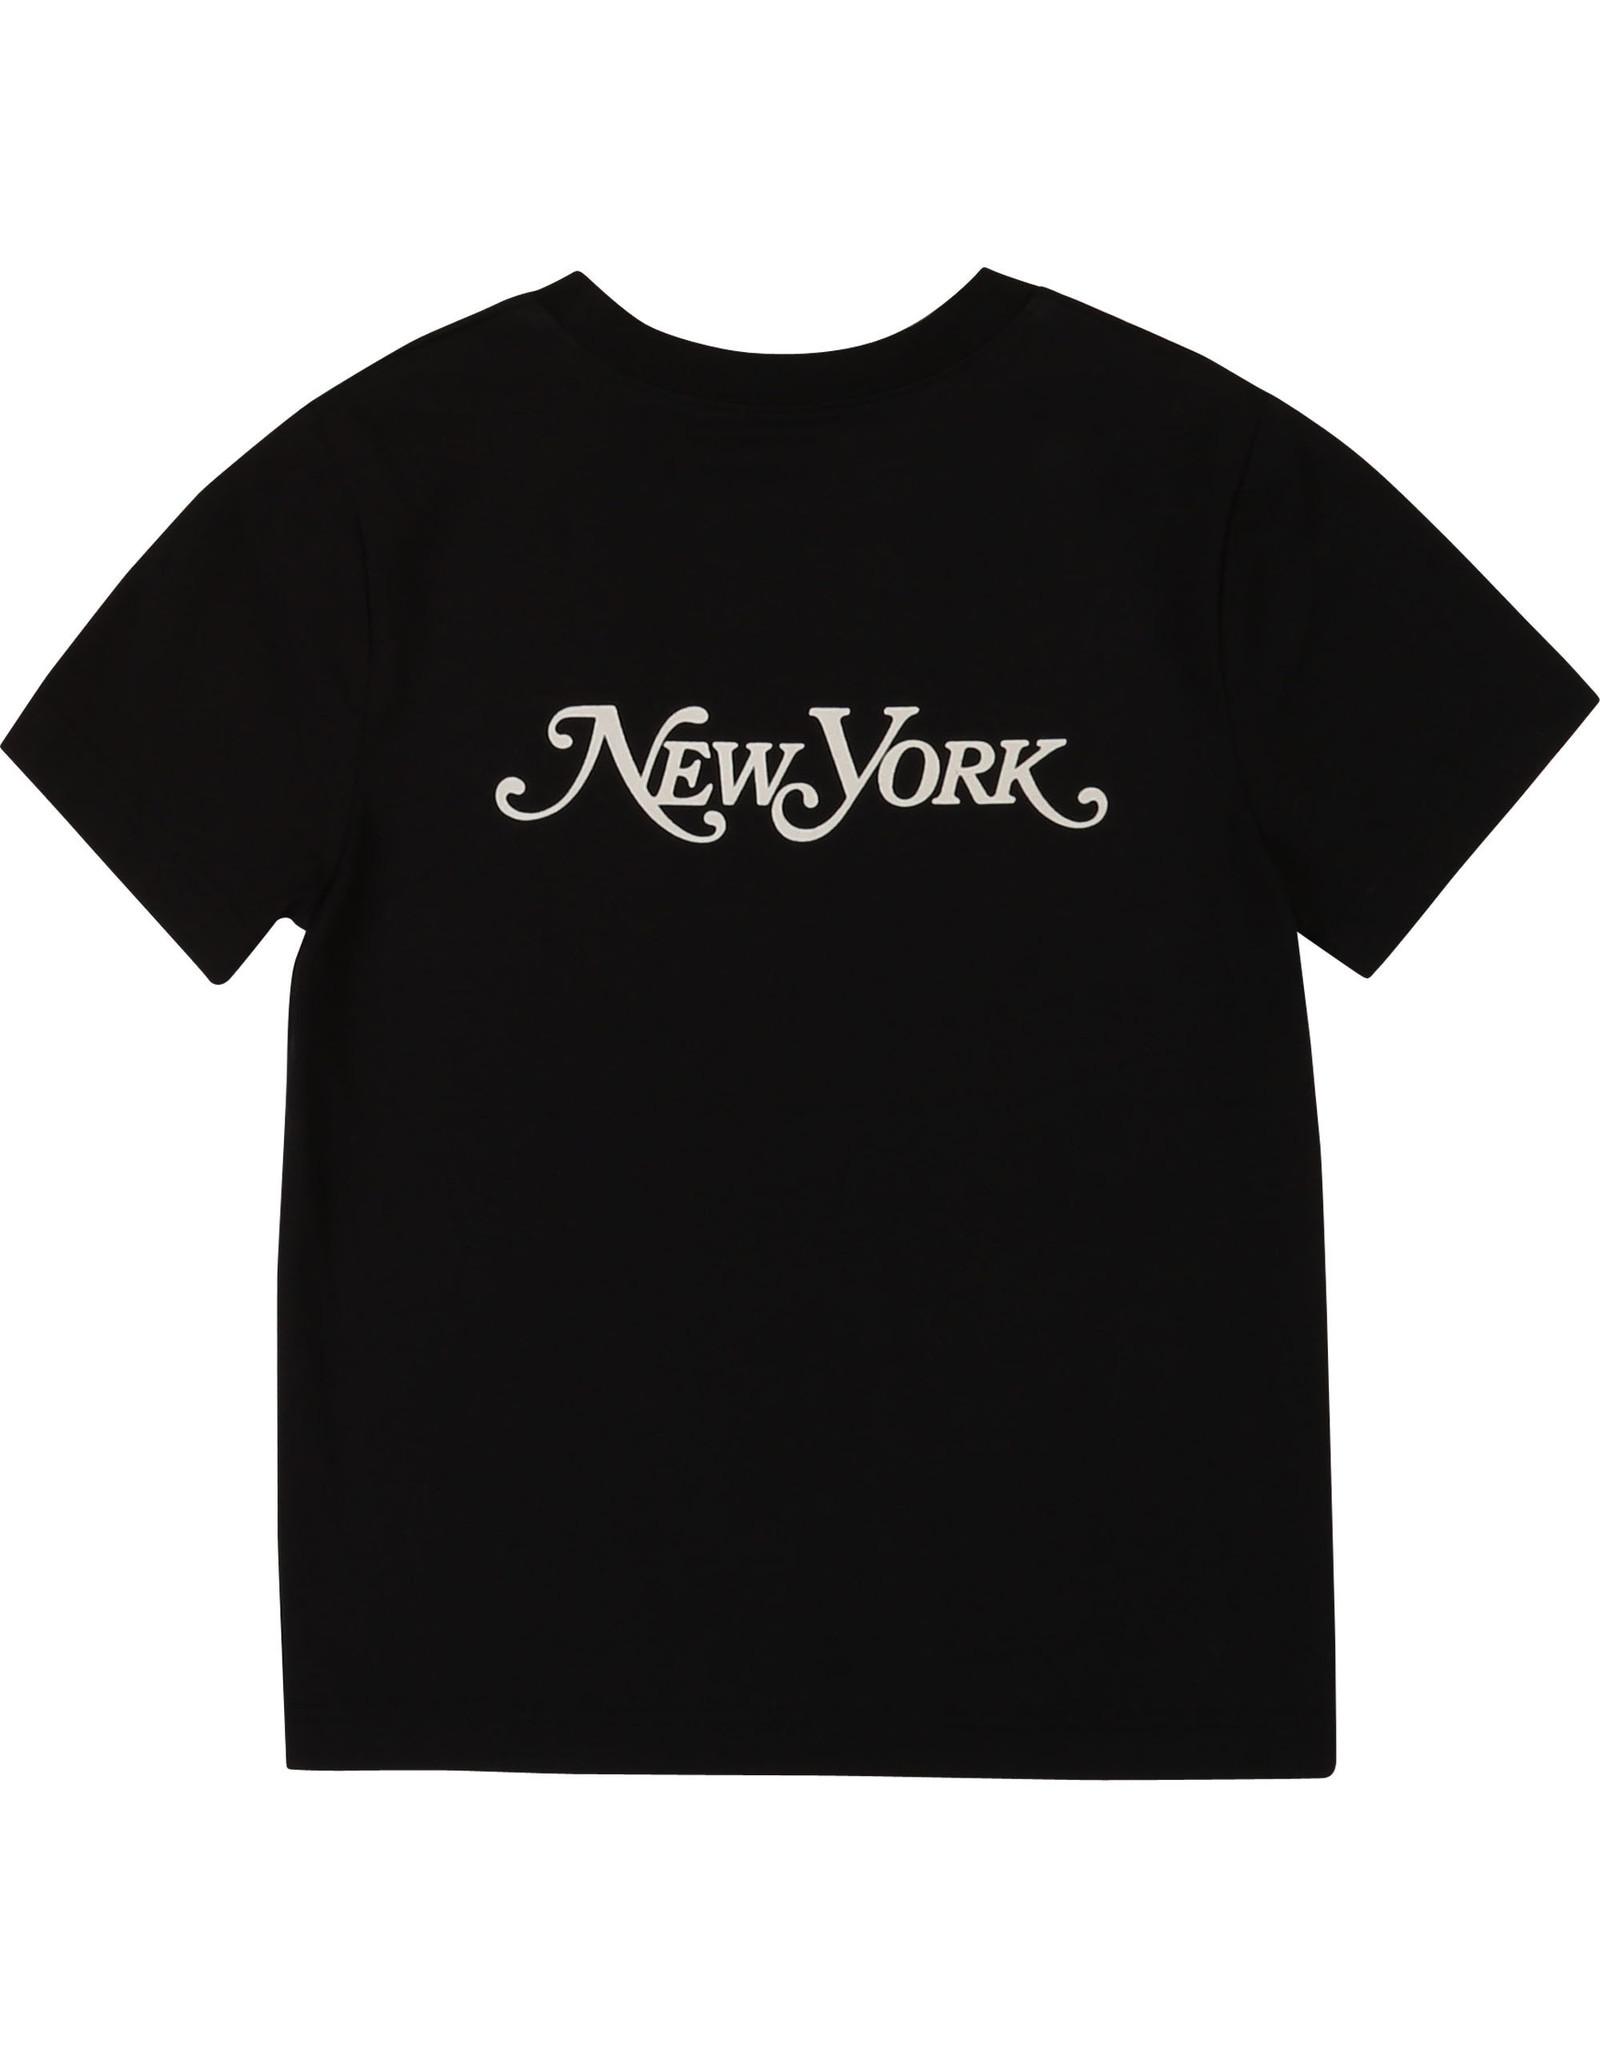 The Marc Jacobs TMJ FW20 Jacob t-shirt black